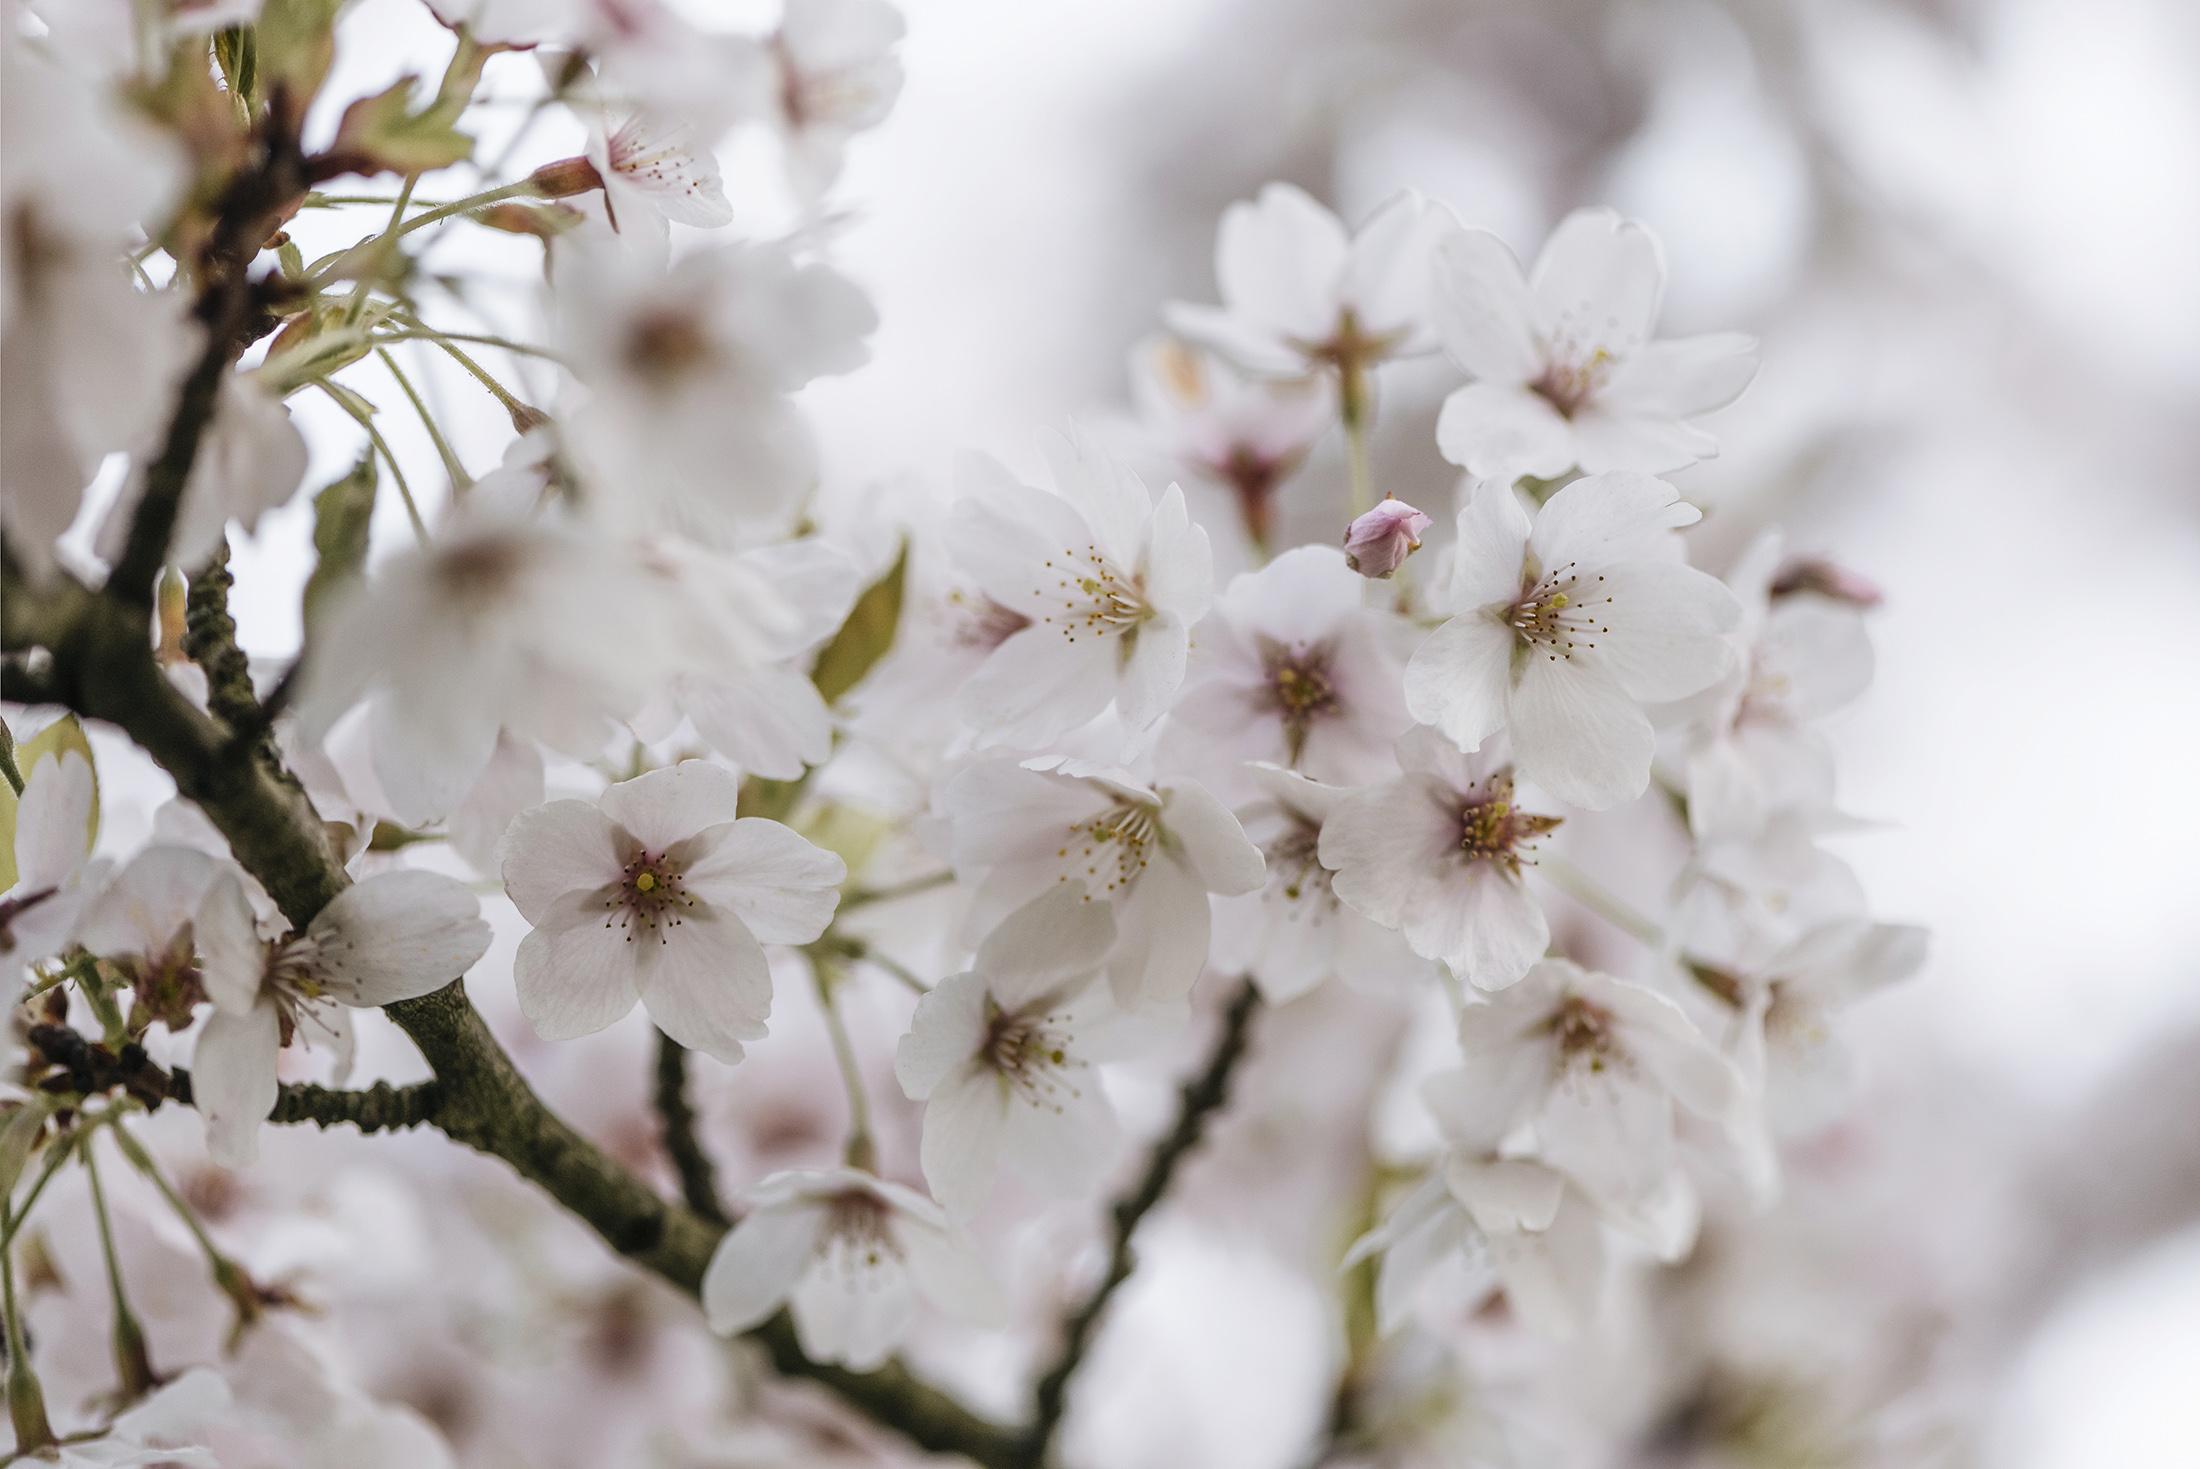 sakura cherry blossom spring flowers